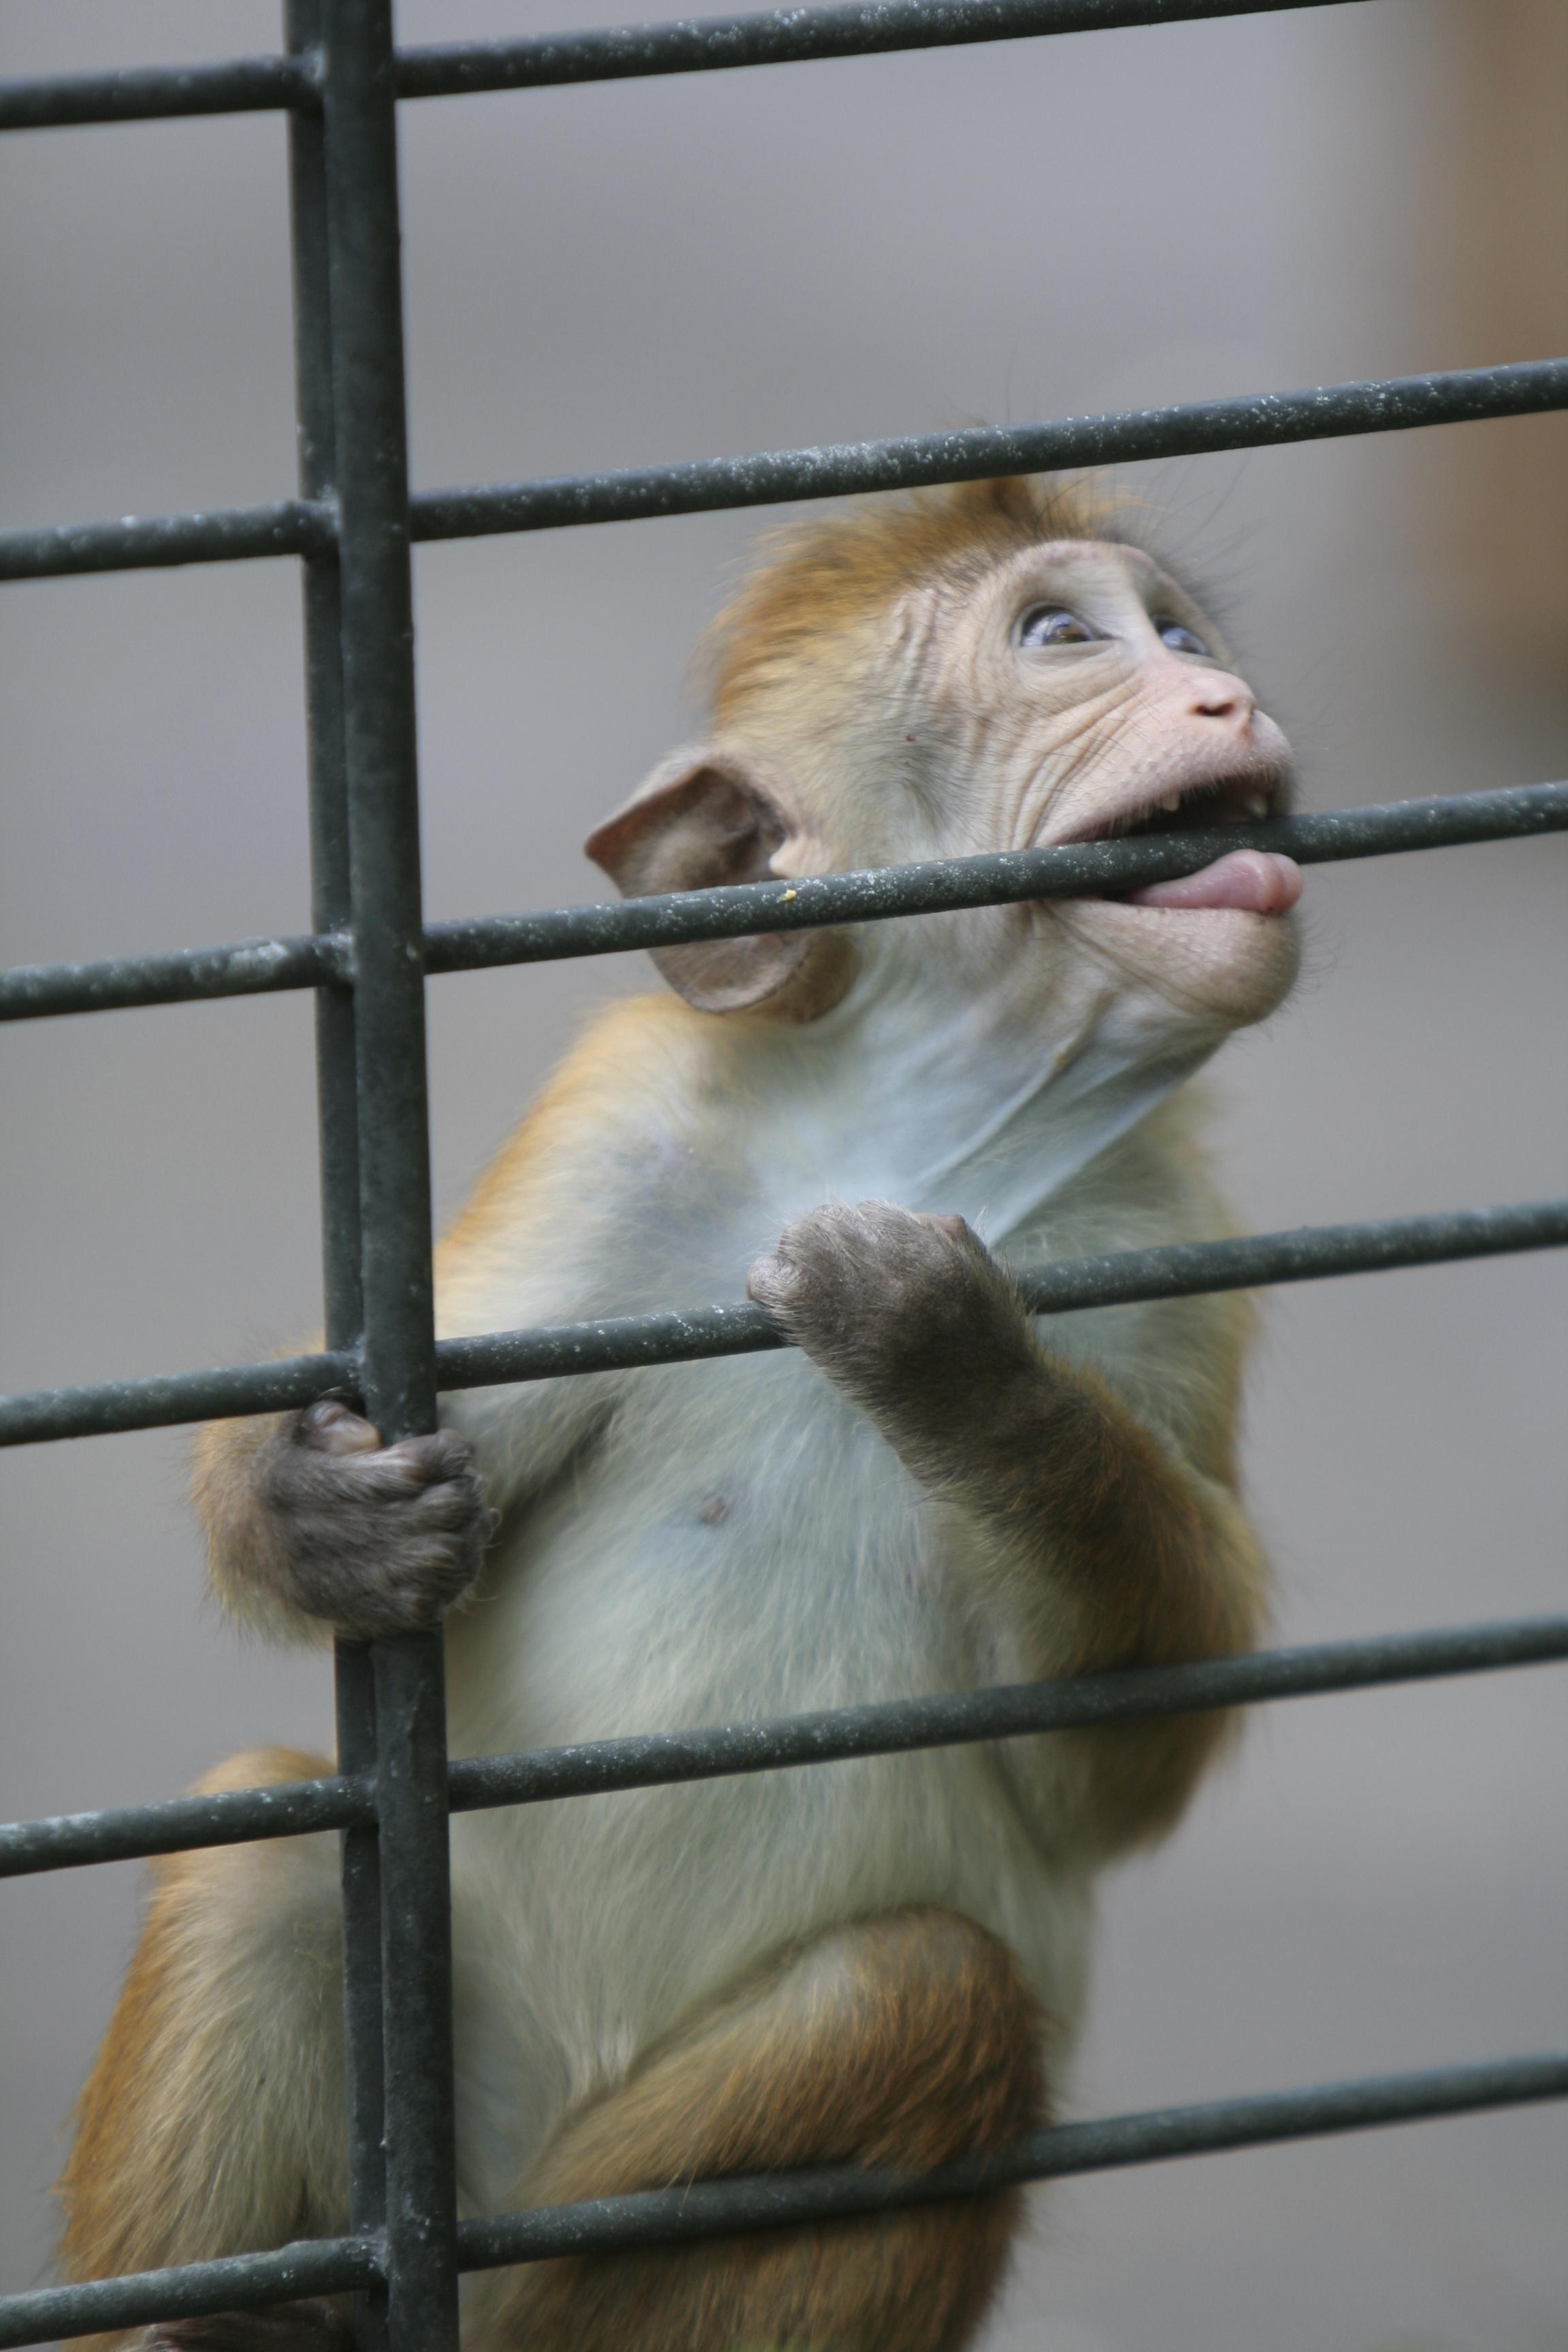 baby_monkey_biting_bars.jpg